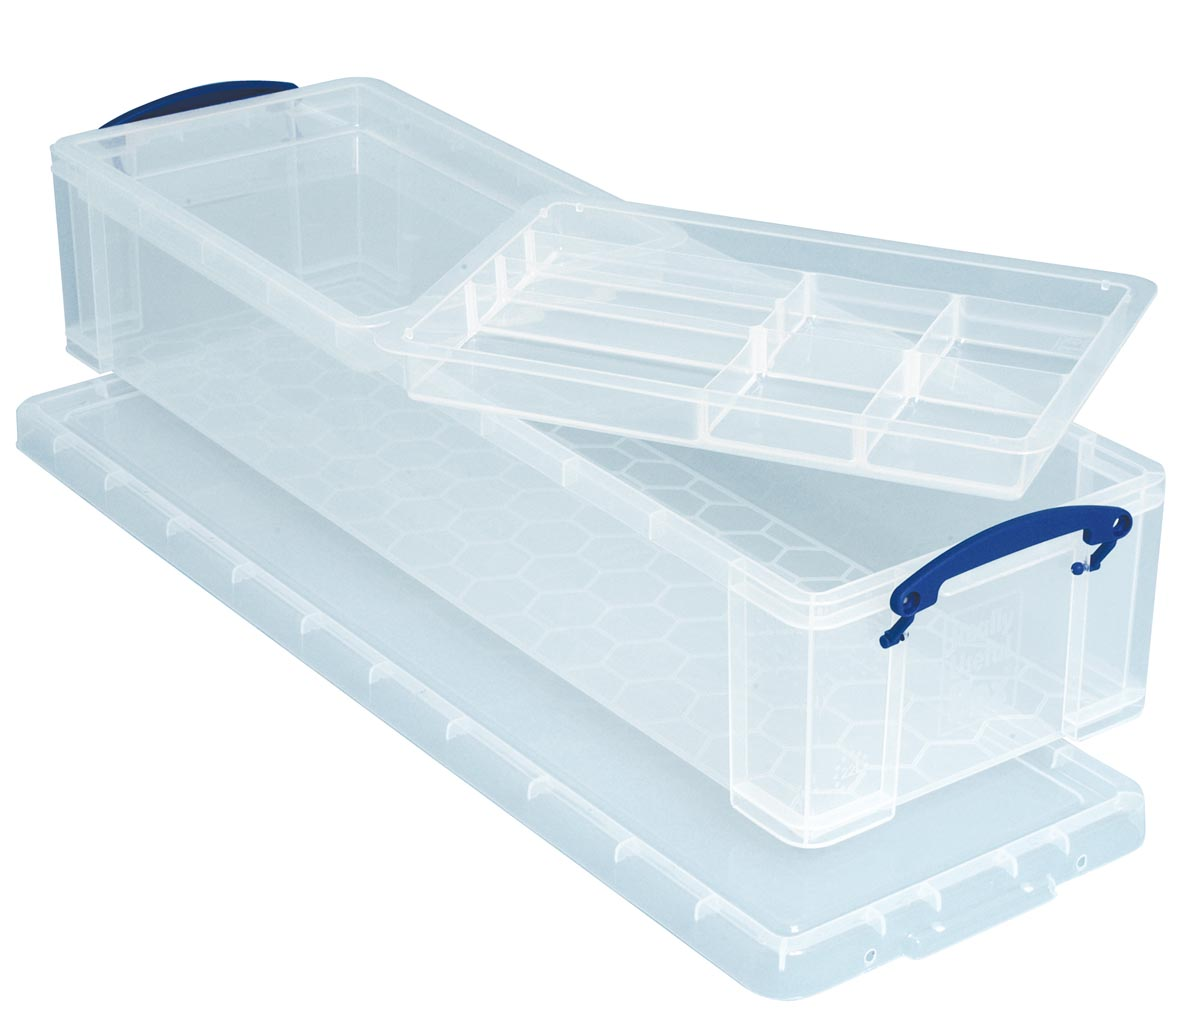 Really Useful Box opbergdoos 22 liter met 2 dividers, transparant